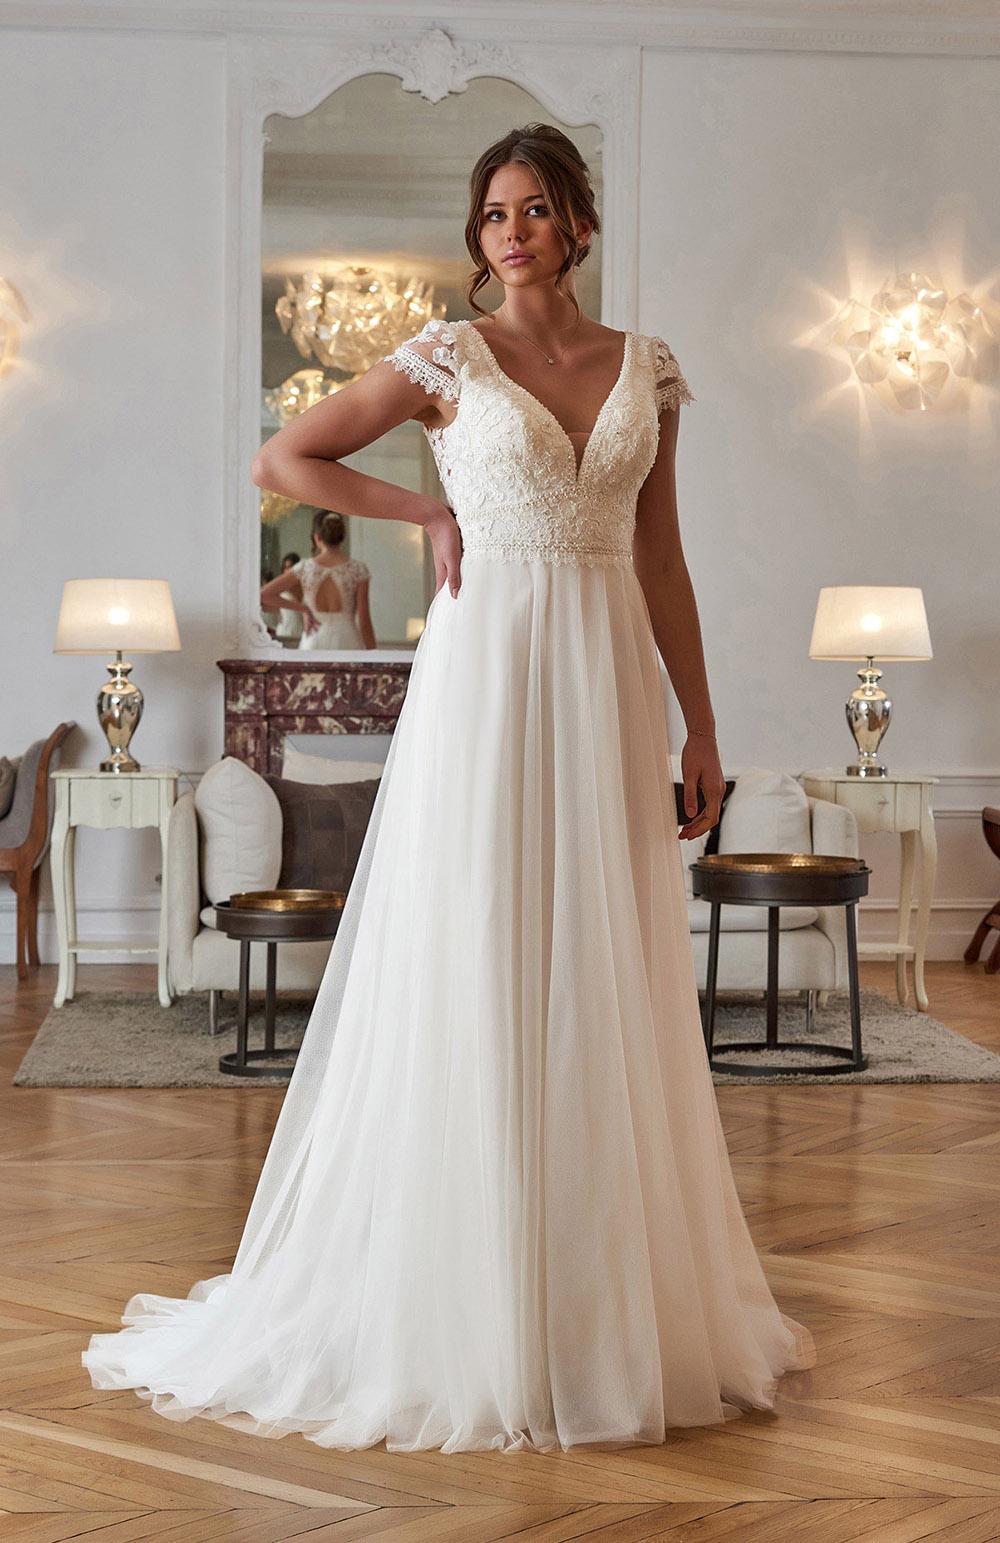 Robe de mariée Modèle Ema